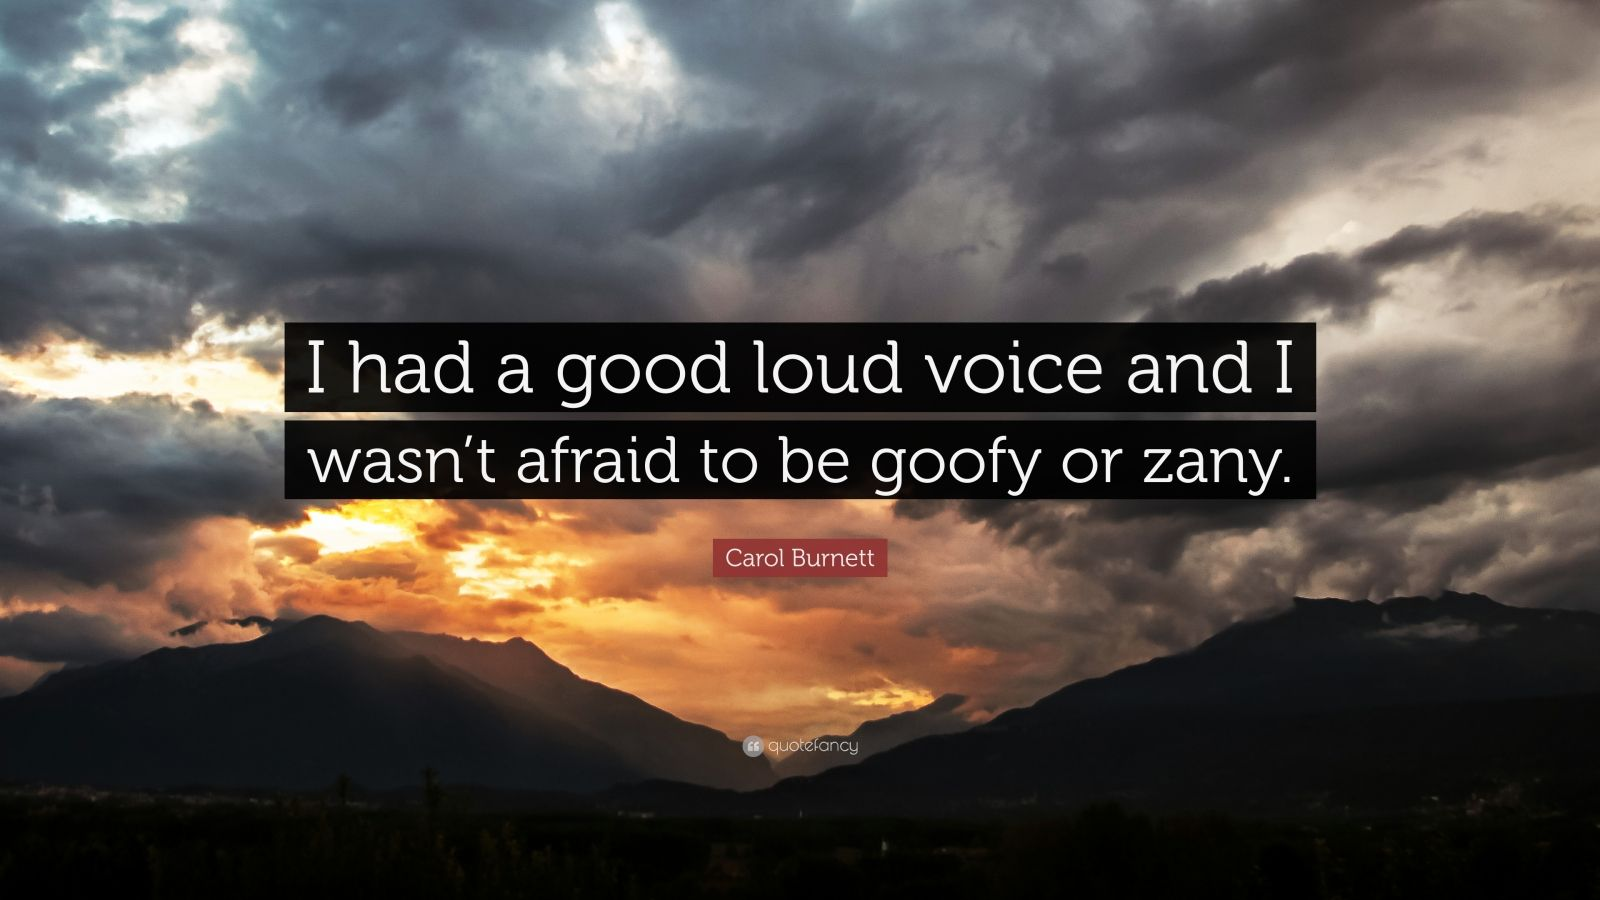 "Carol Burnett Quote: ""I had a good loud voice and I wasn't afraid to be goofy or zany."""